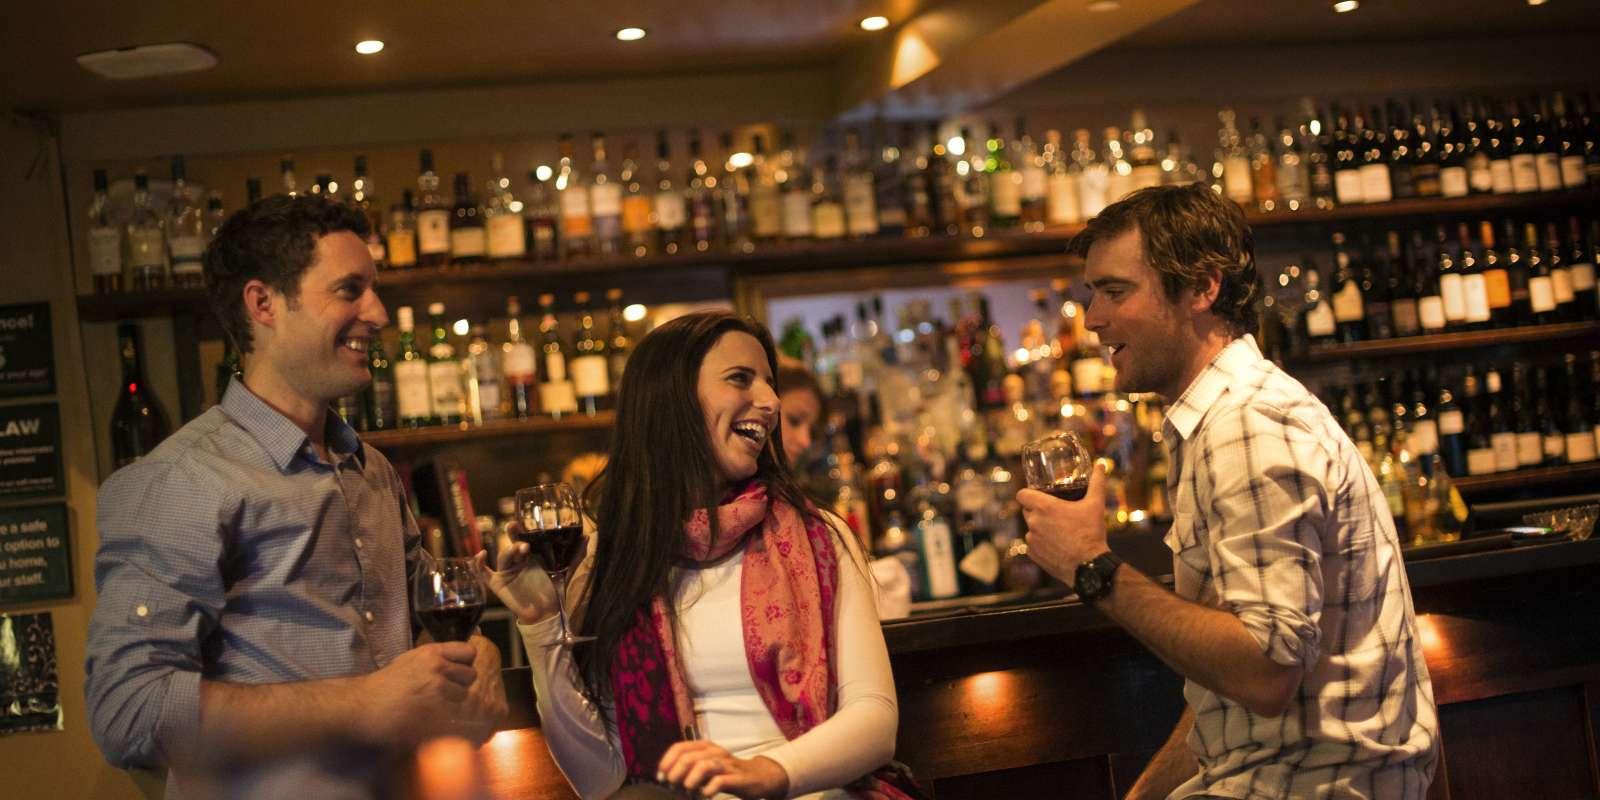 Friends having drinks at Bardeaux